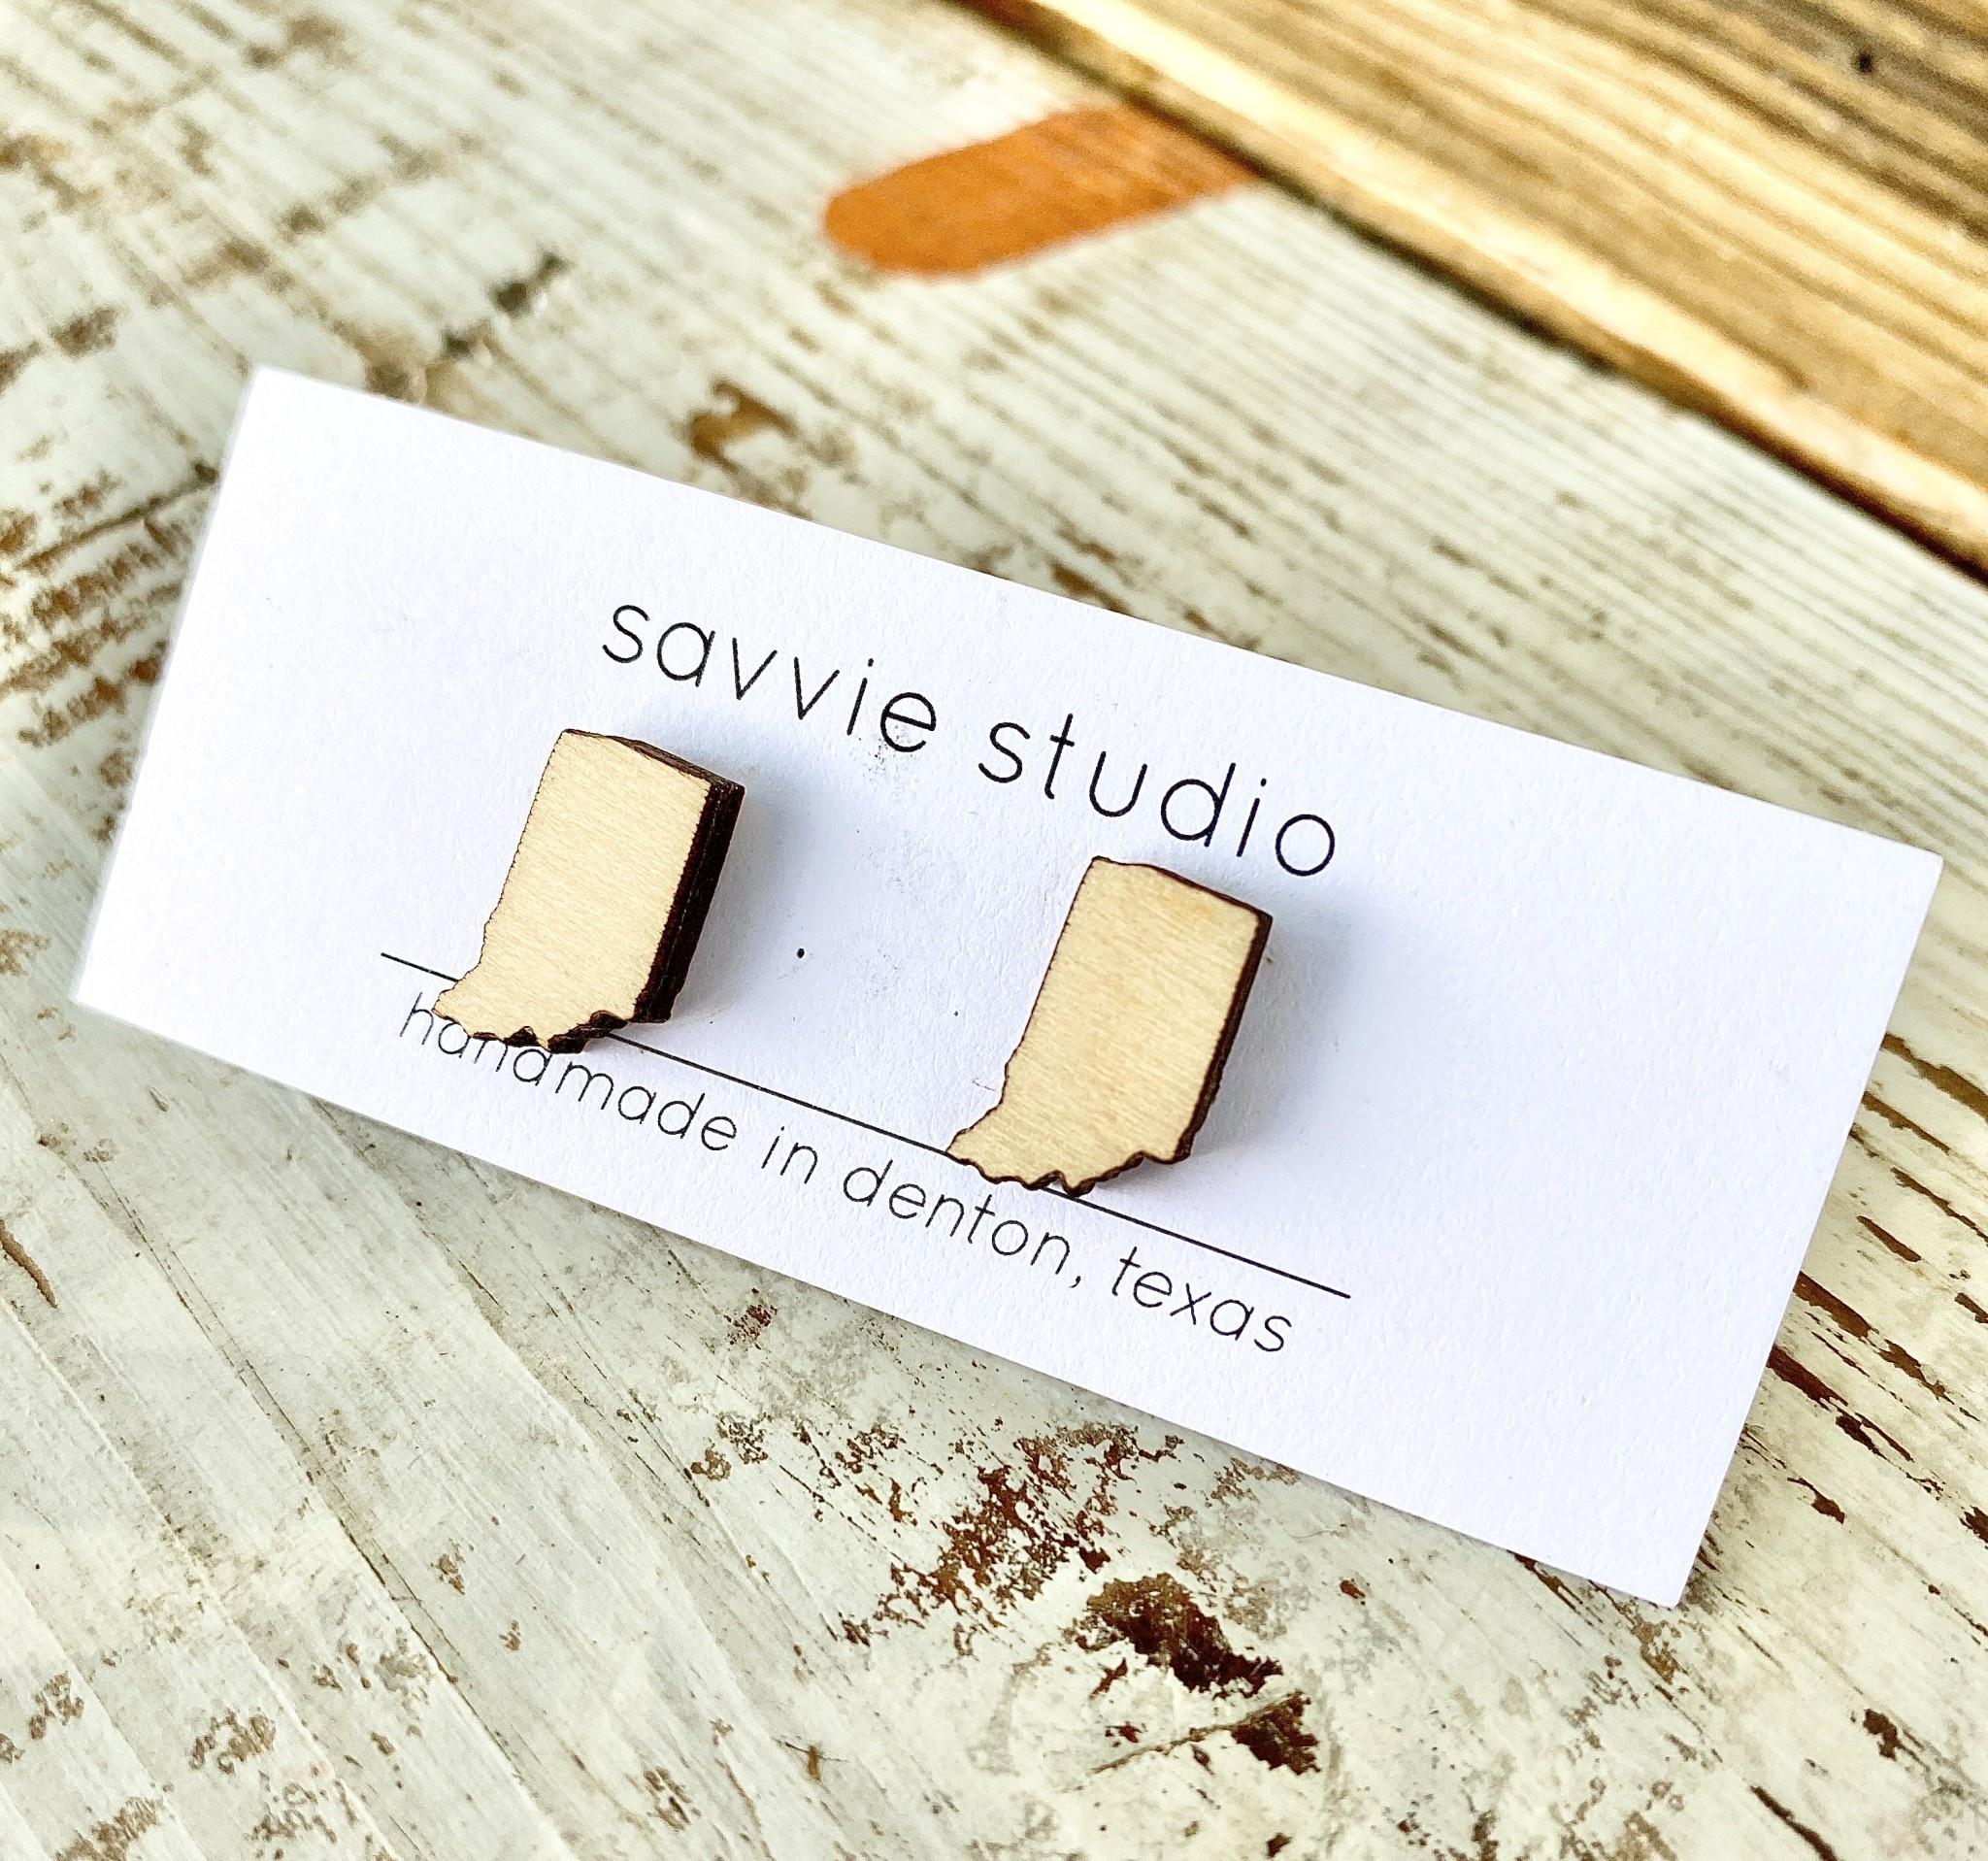 Savvie Studio Birch Indiana Post Earrings